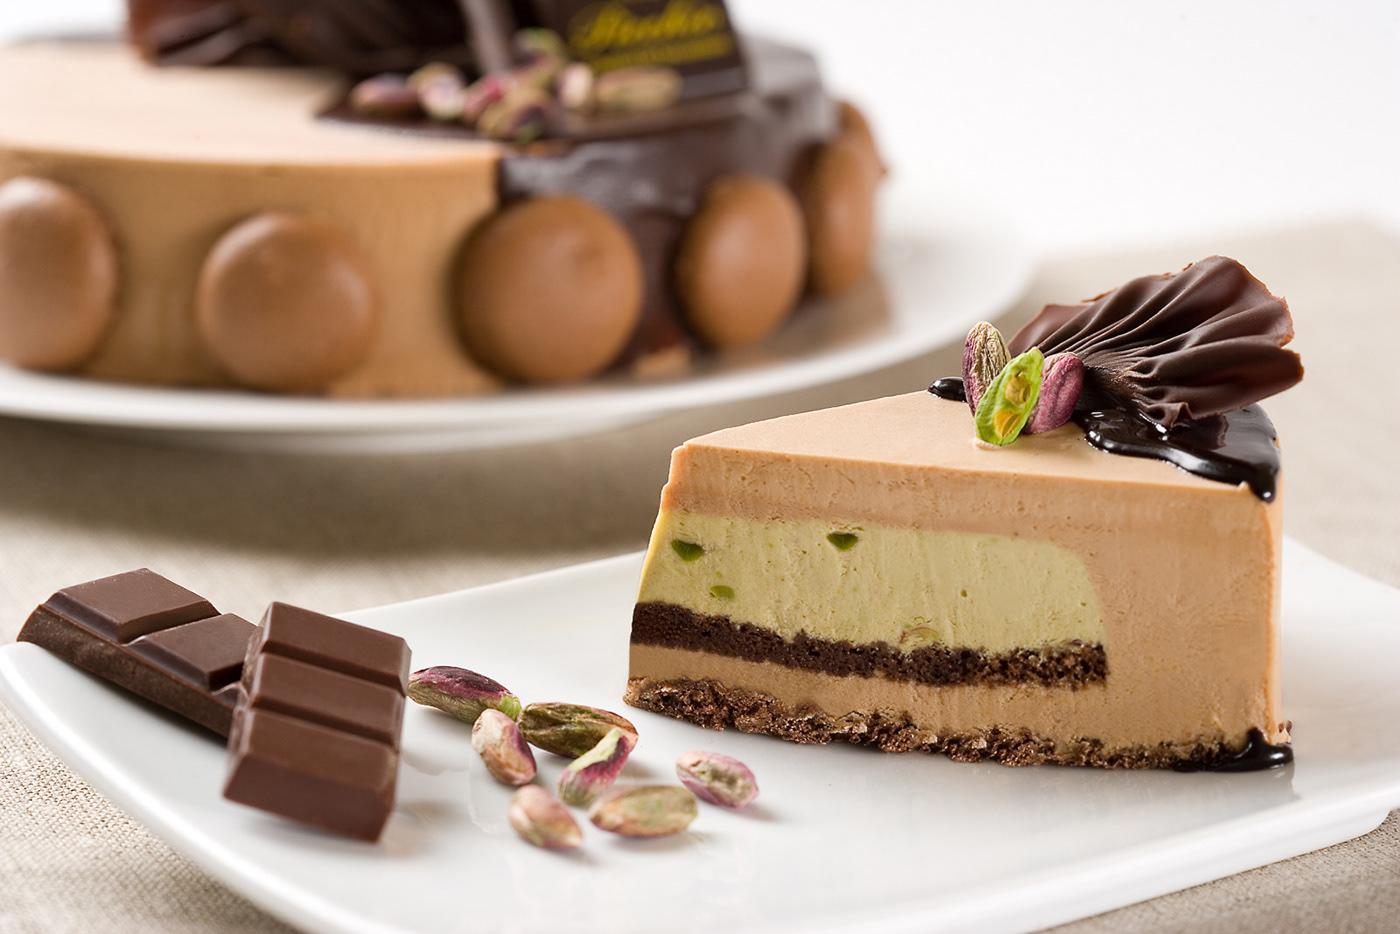 Image may contain: cake, birthday cake and chocolate